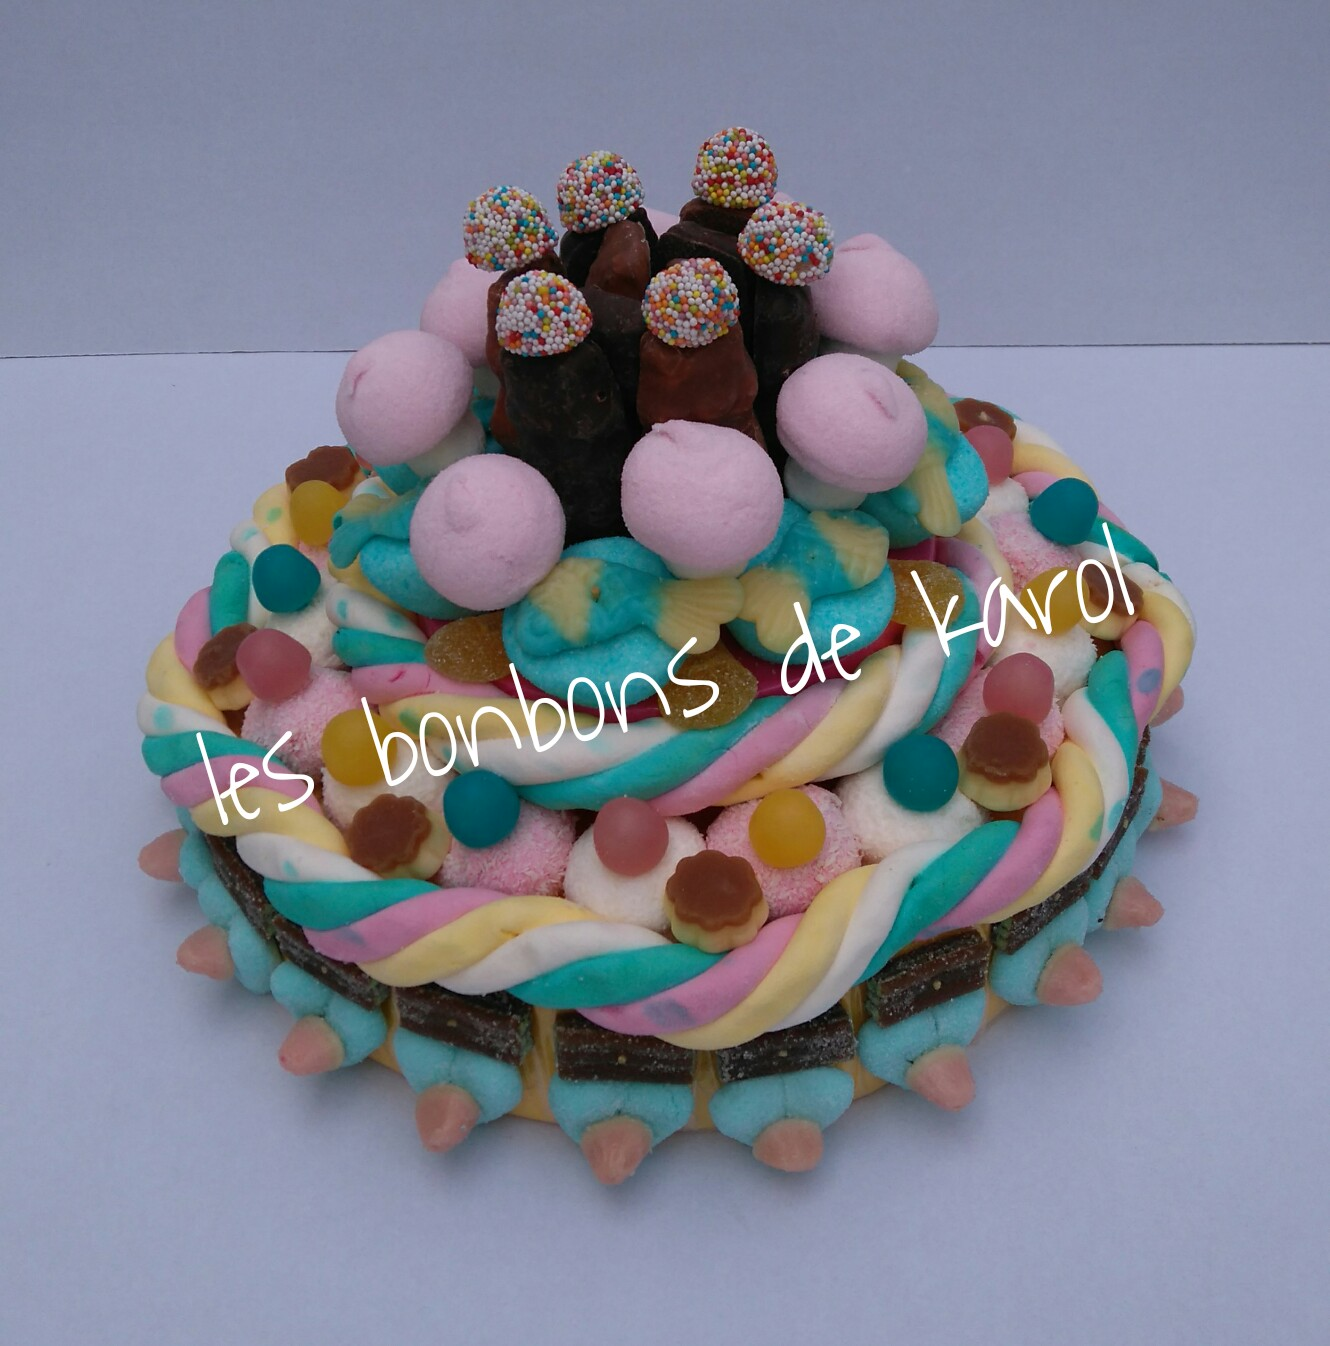 SAMBA 38 € (1180 gr et 148 bonbons + 2 tresses guimauve + 10 ours chocolat - diam 30 ht 20 cm)